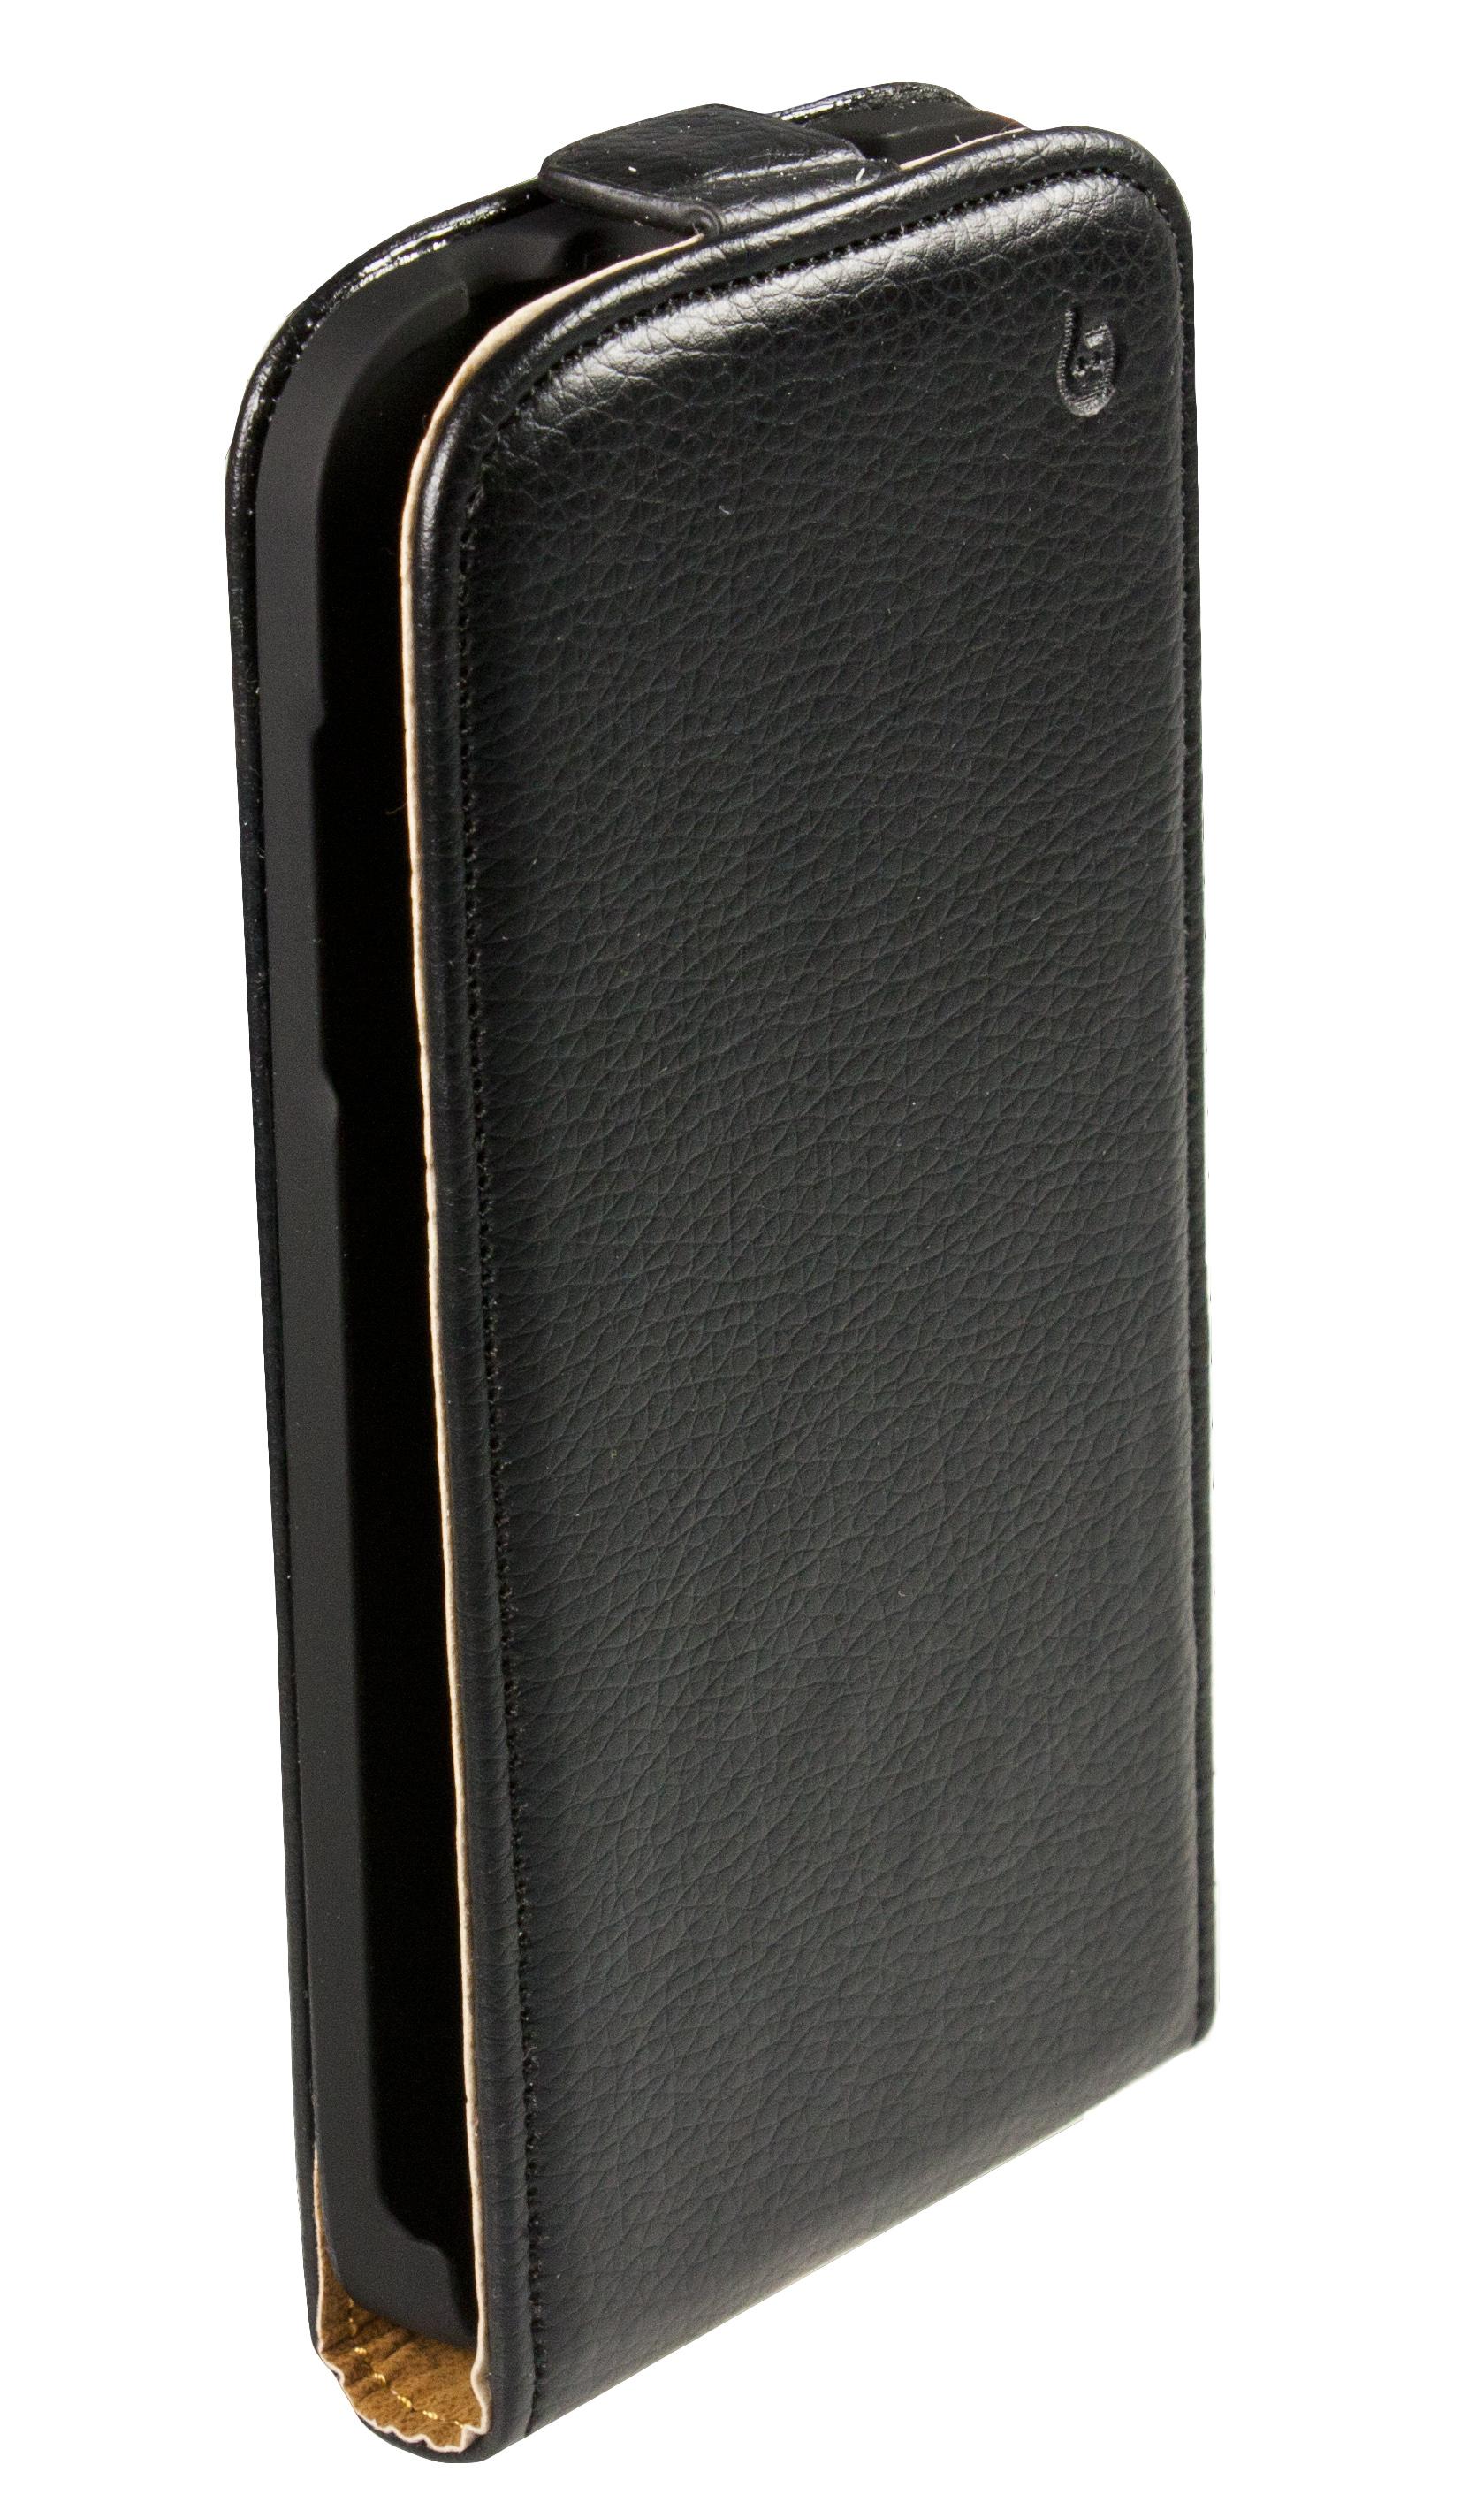 ����� Flip-case Samsung Galaxy S4 Active GT-I9295 (������), ����� Slim